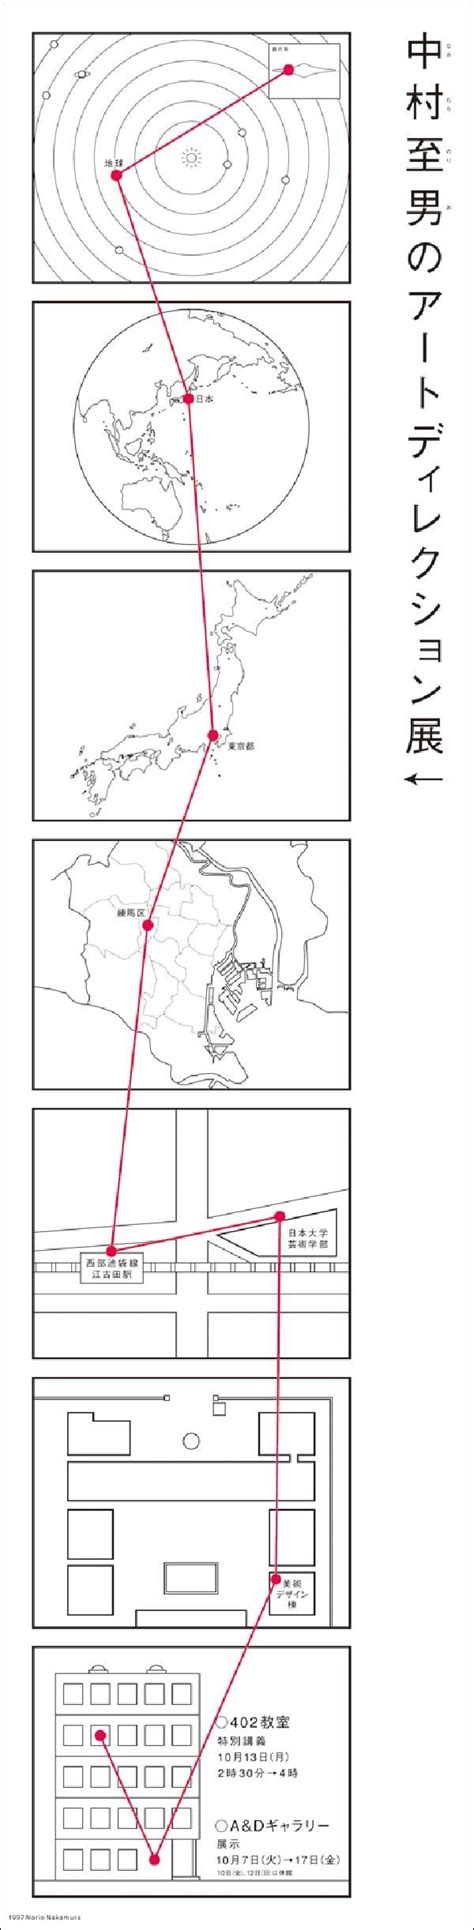 Map 3 Princess 2 Design norio nakamura s simple lines infografia cosas bonitas y mapas